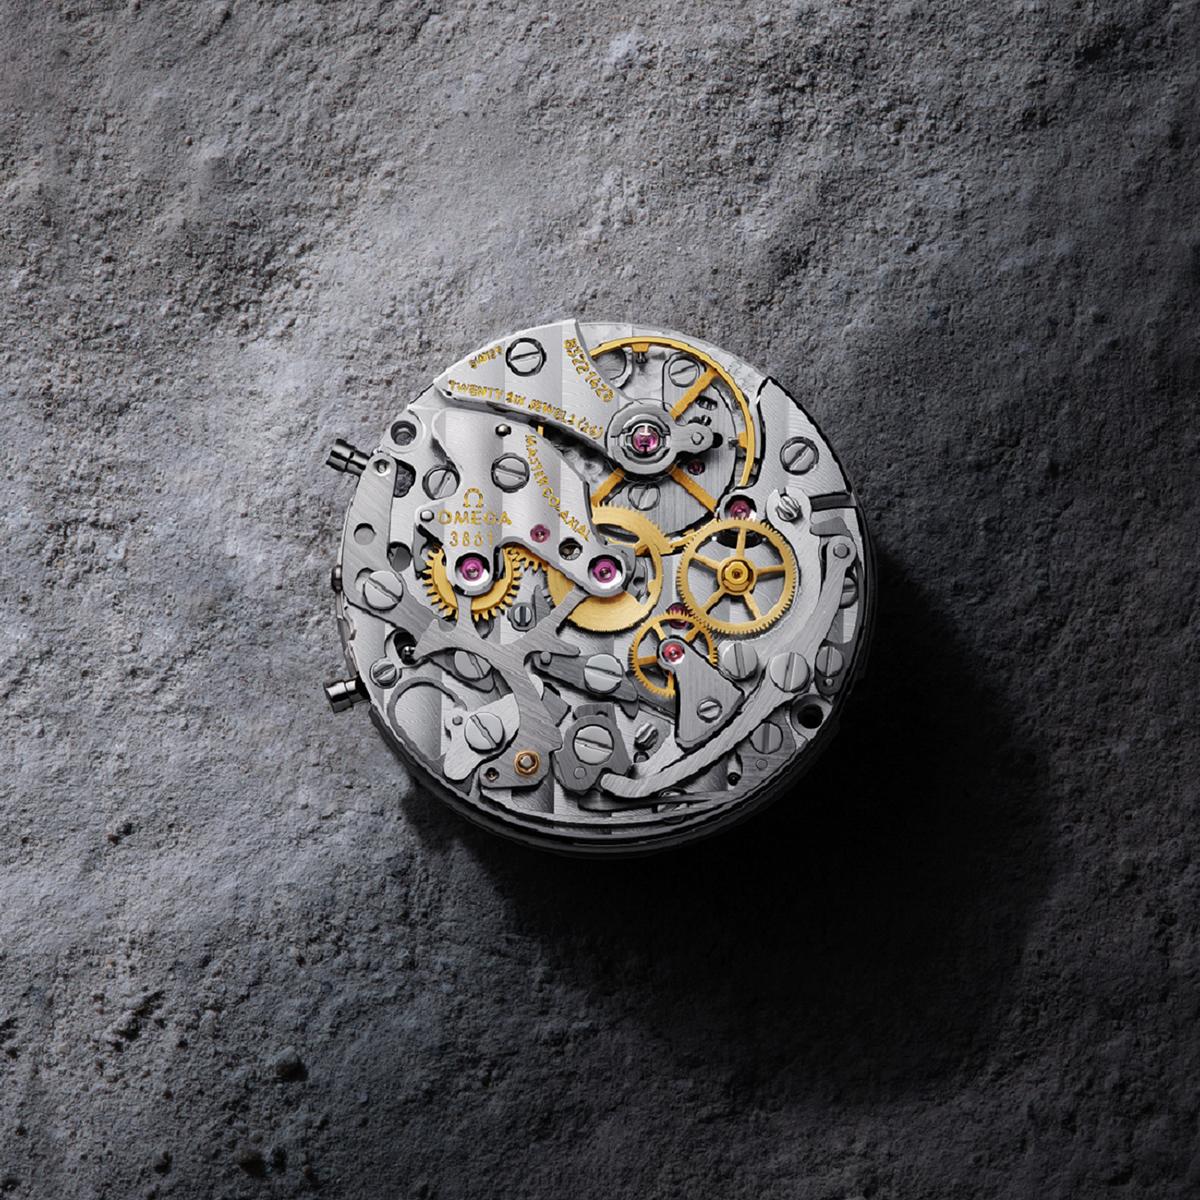 OMEGA's watchmaking heritage